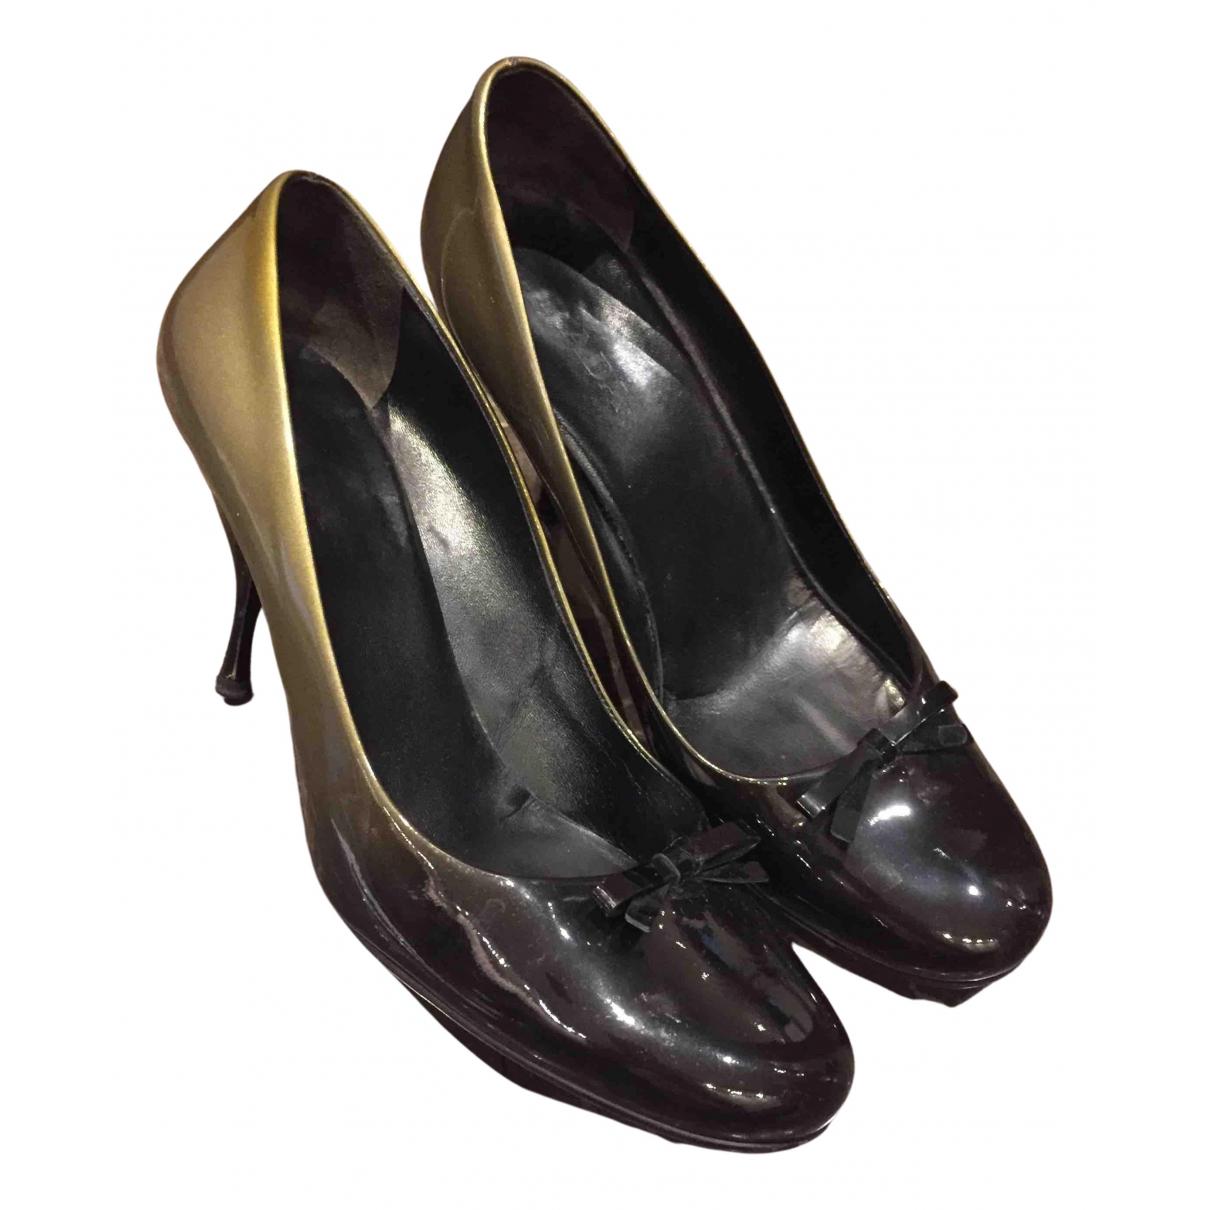 Prada N Green Patent leather Heels for Women 39 EU